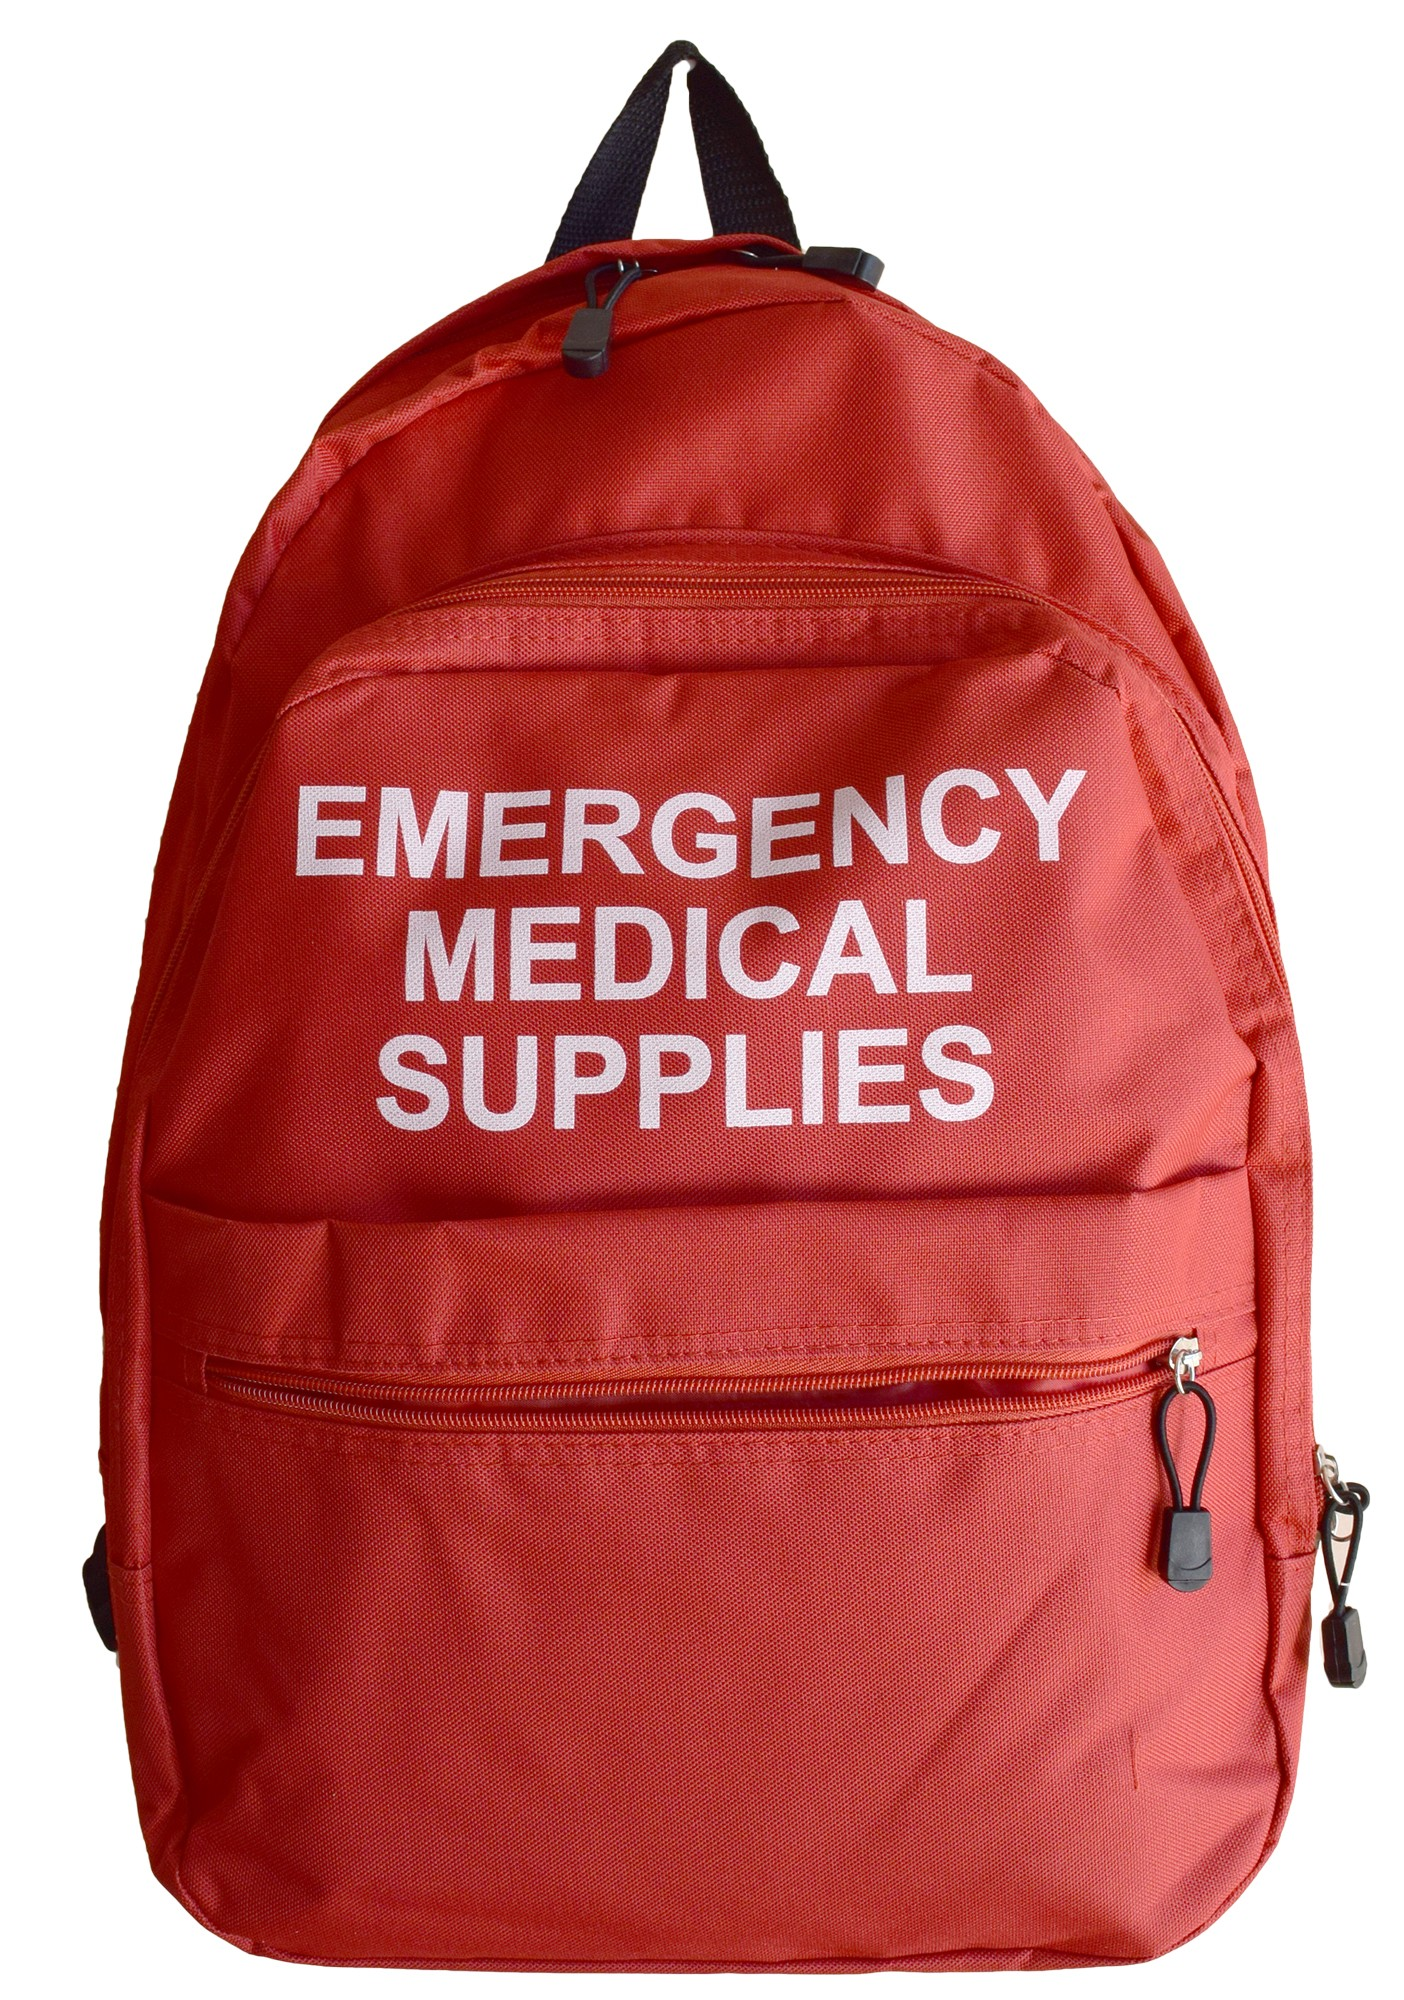 Epinephrine / Inhaler Field Trip Bag w/ Velcro® mounting system